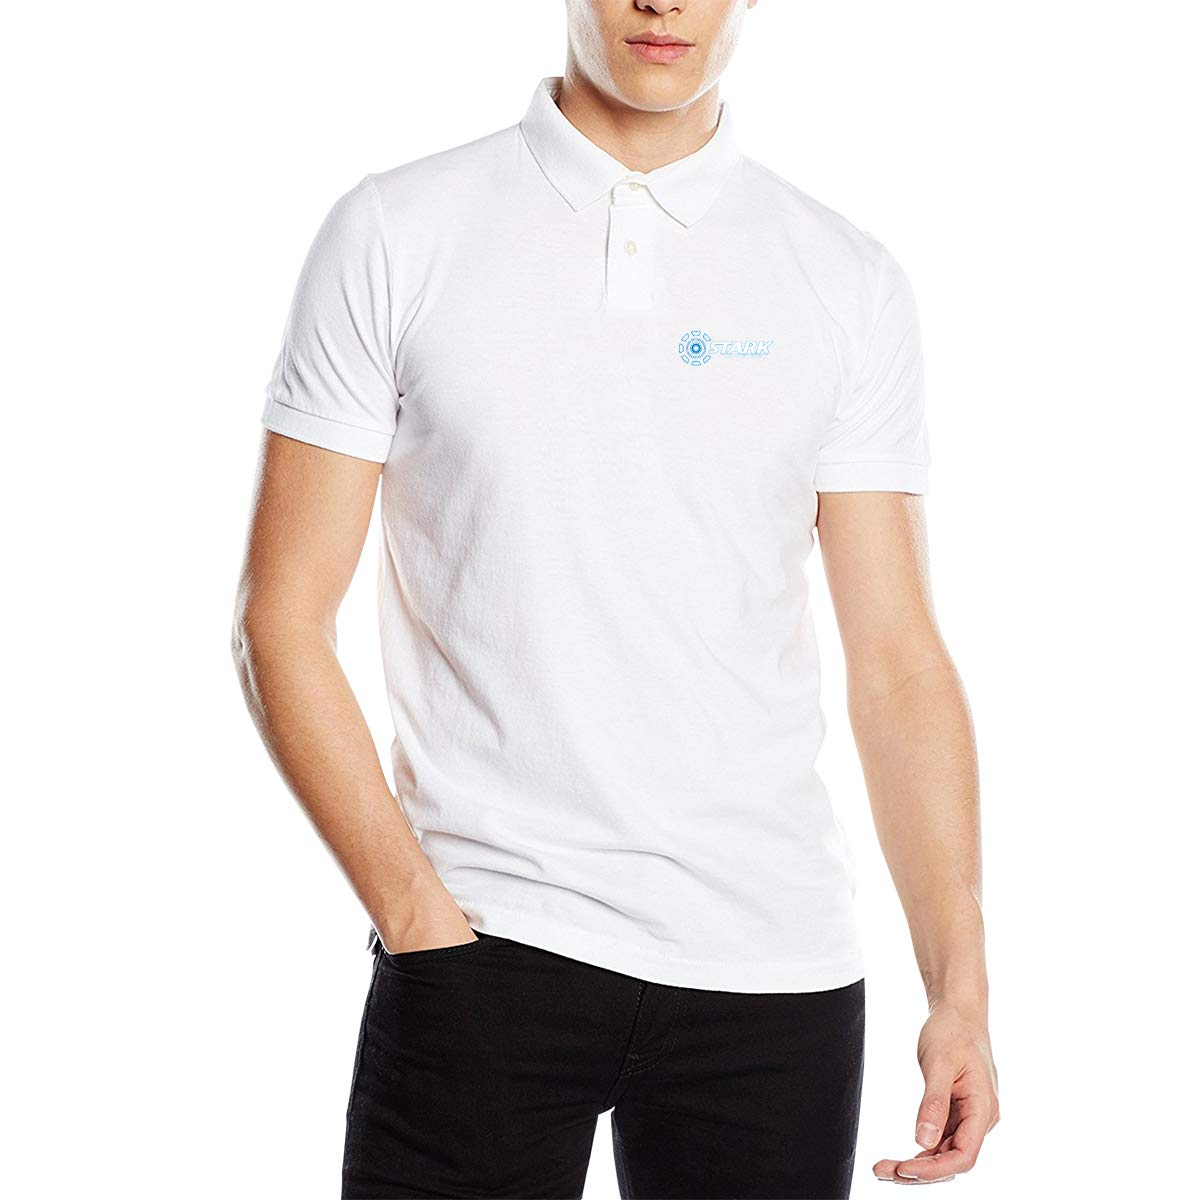 Stark Indu stries Mens Regular-Fit Cotton Polo Shirt Short Sleeve